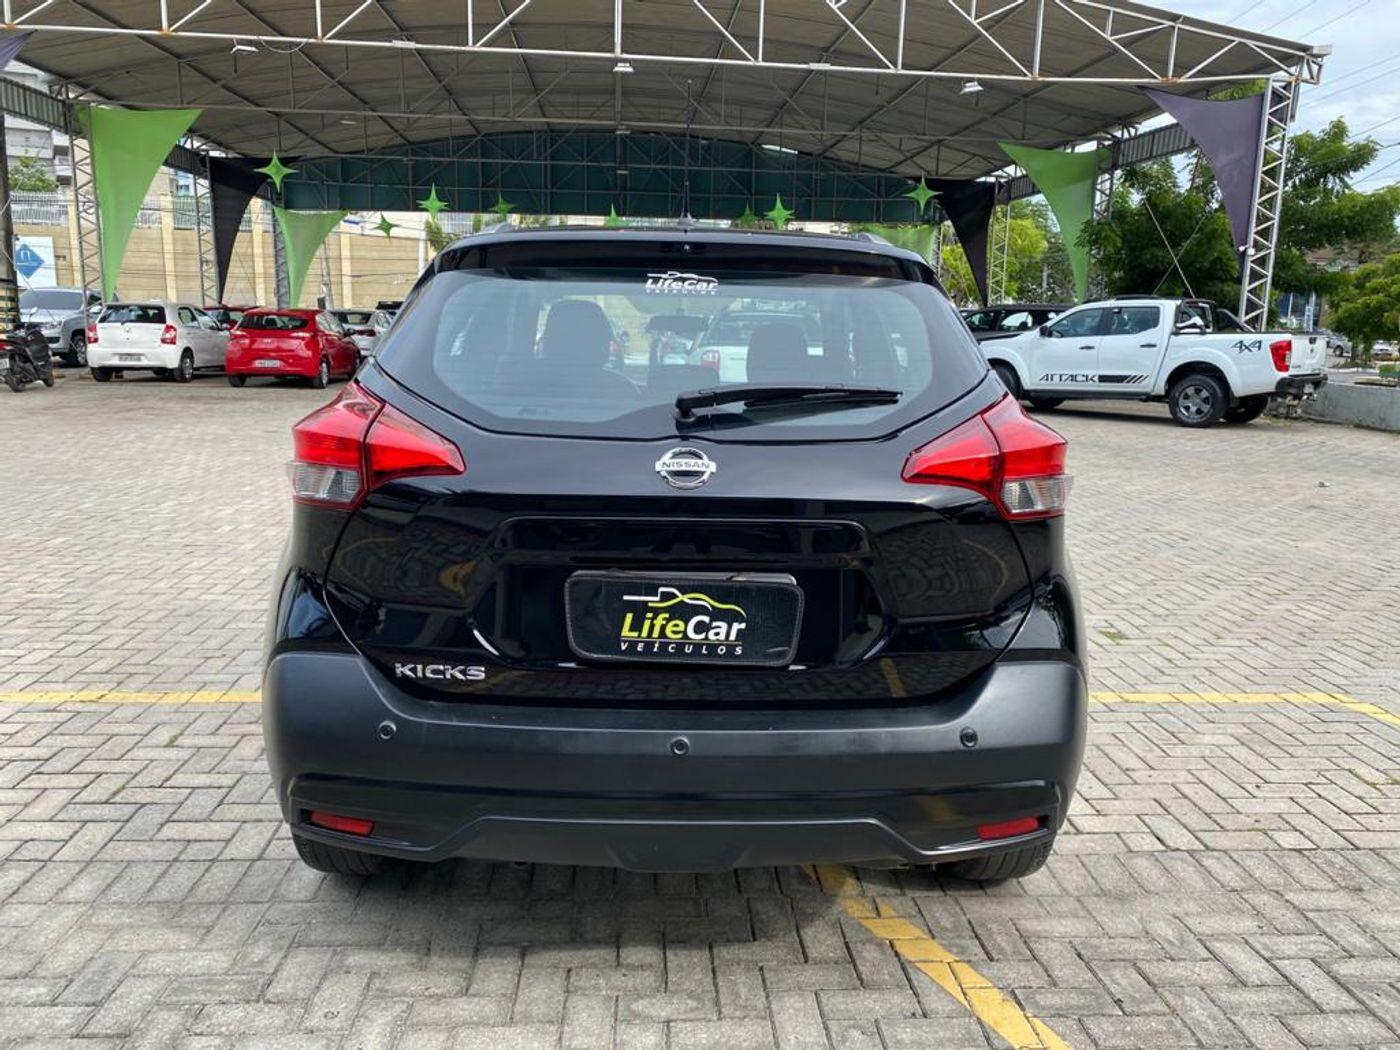 Nissan KICKS SV Limited 1.6 16V Flex 5p Aut.